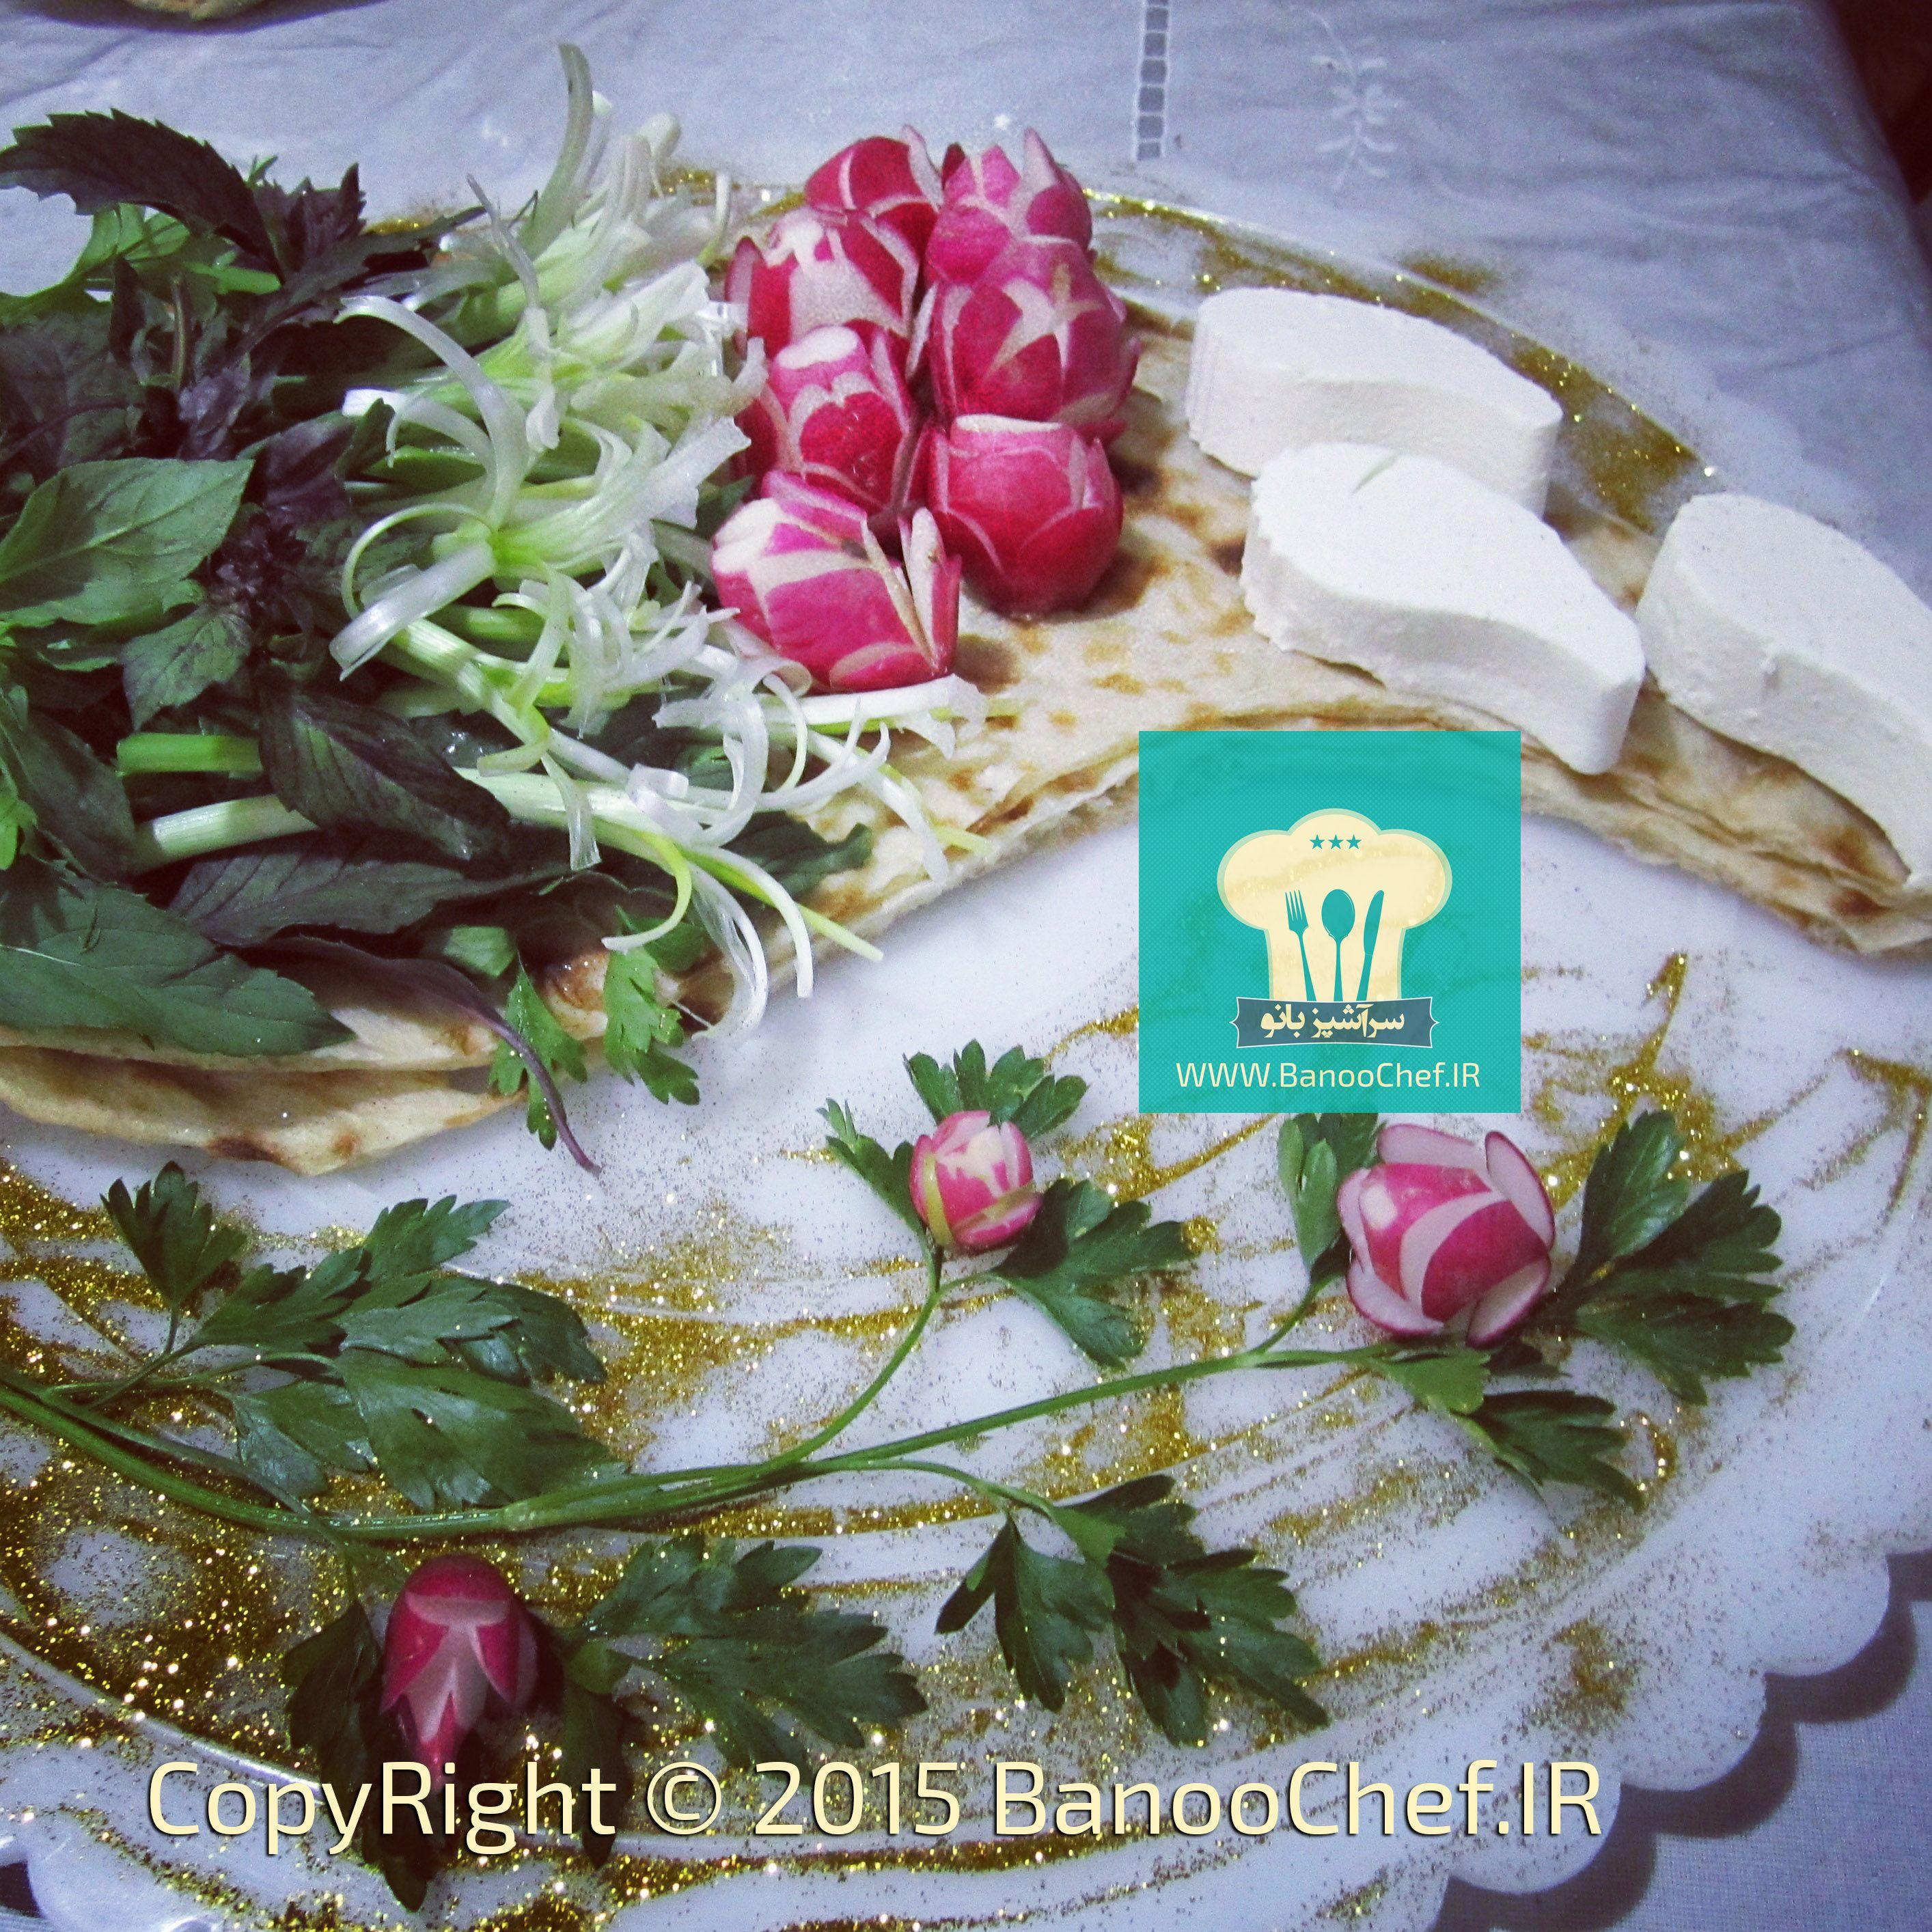 Malayer ملایر Persian Food Food Design Appetizers